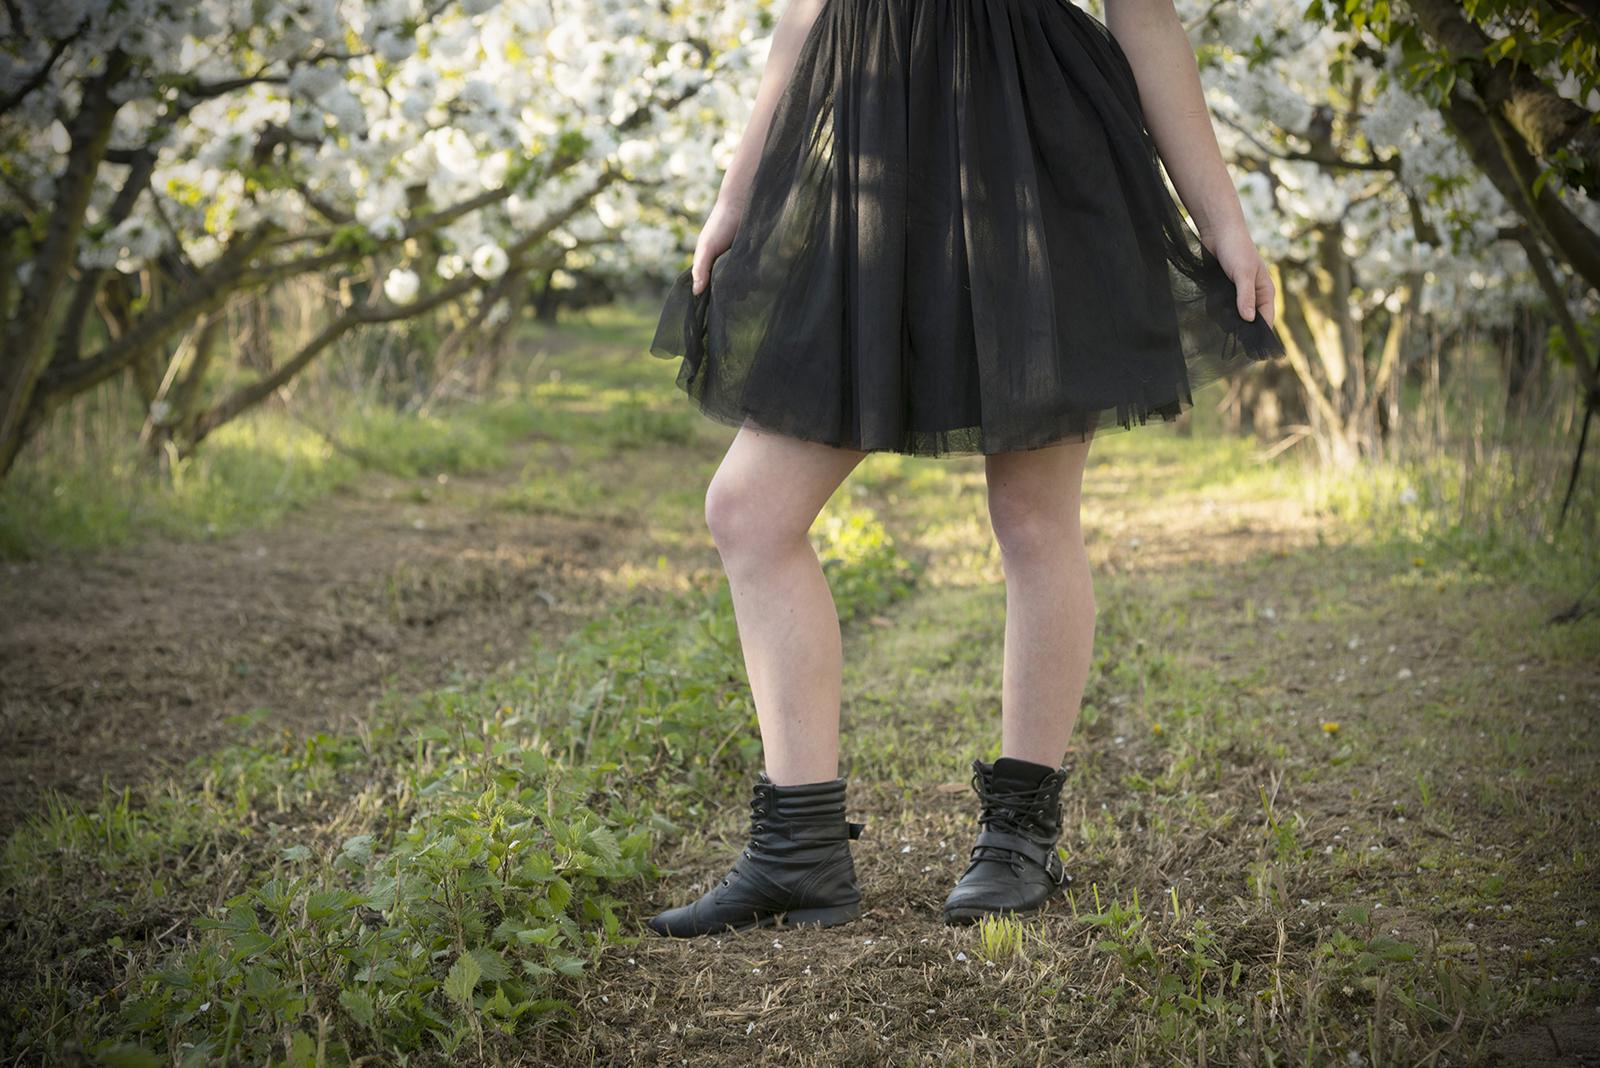 jambes de jeune fille